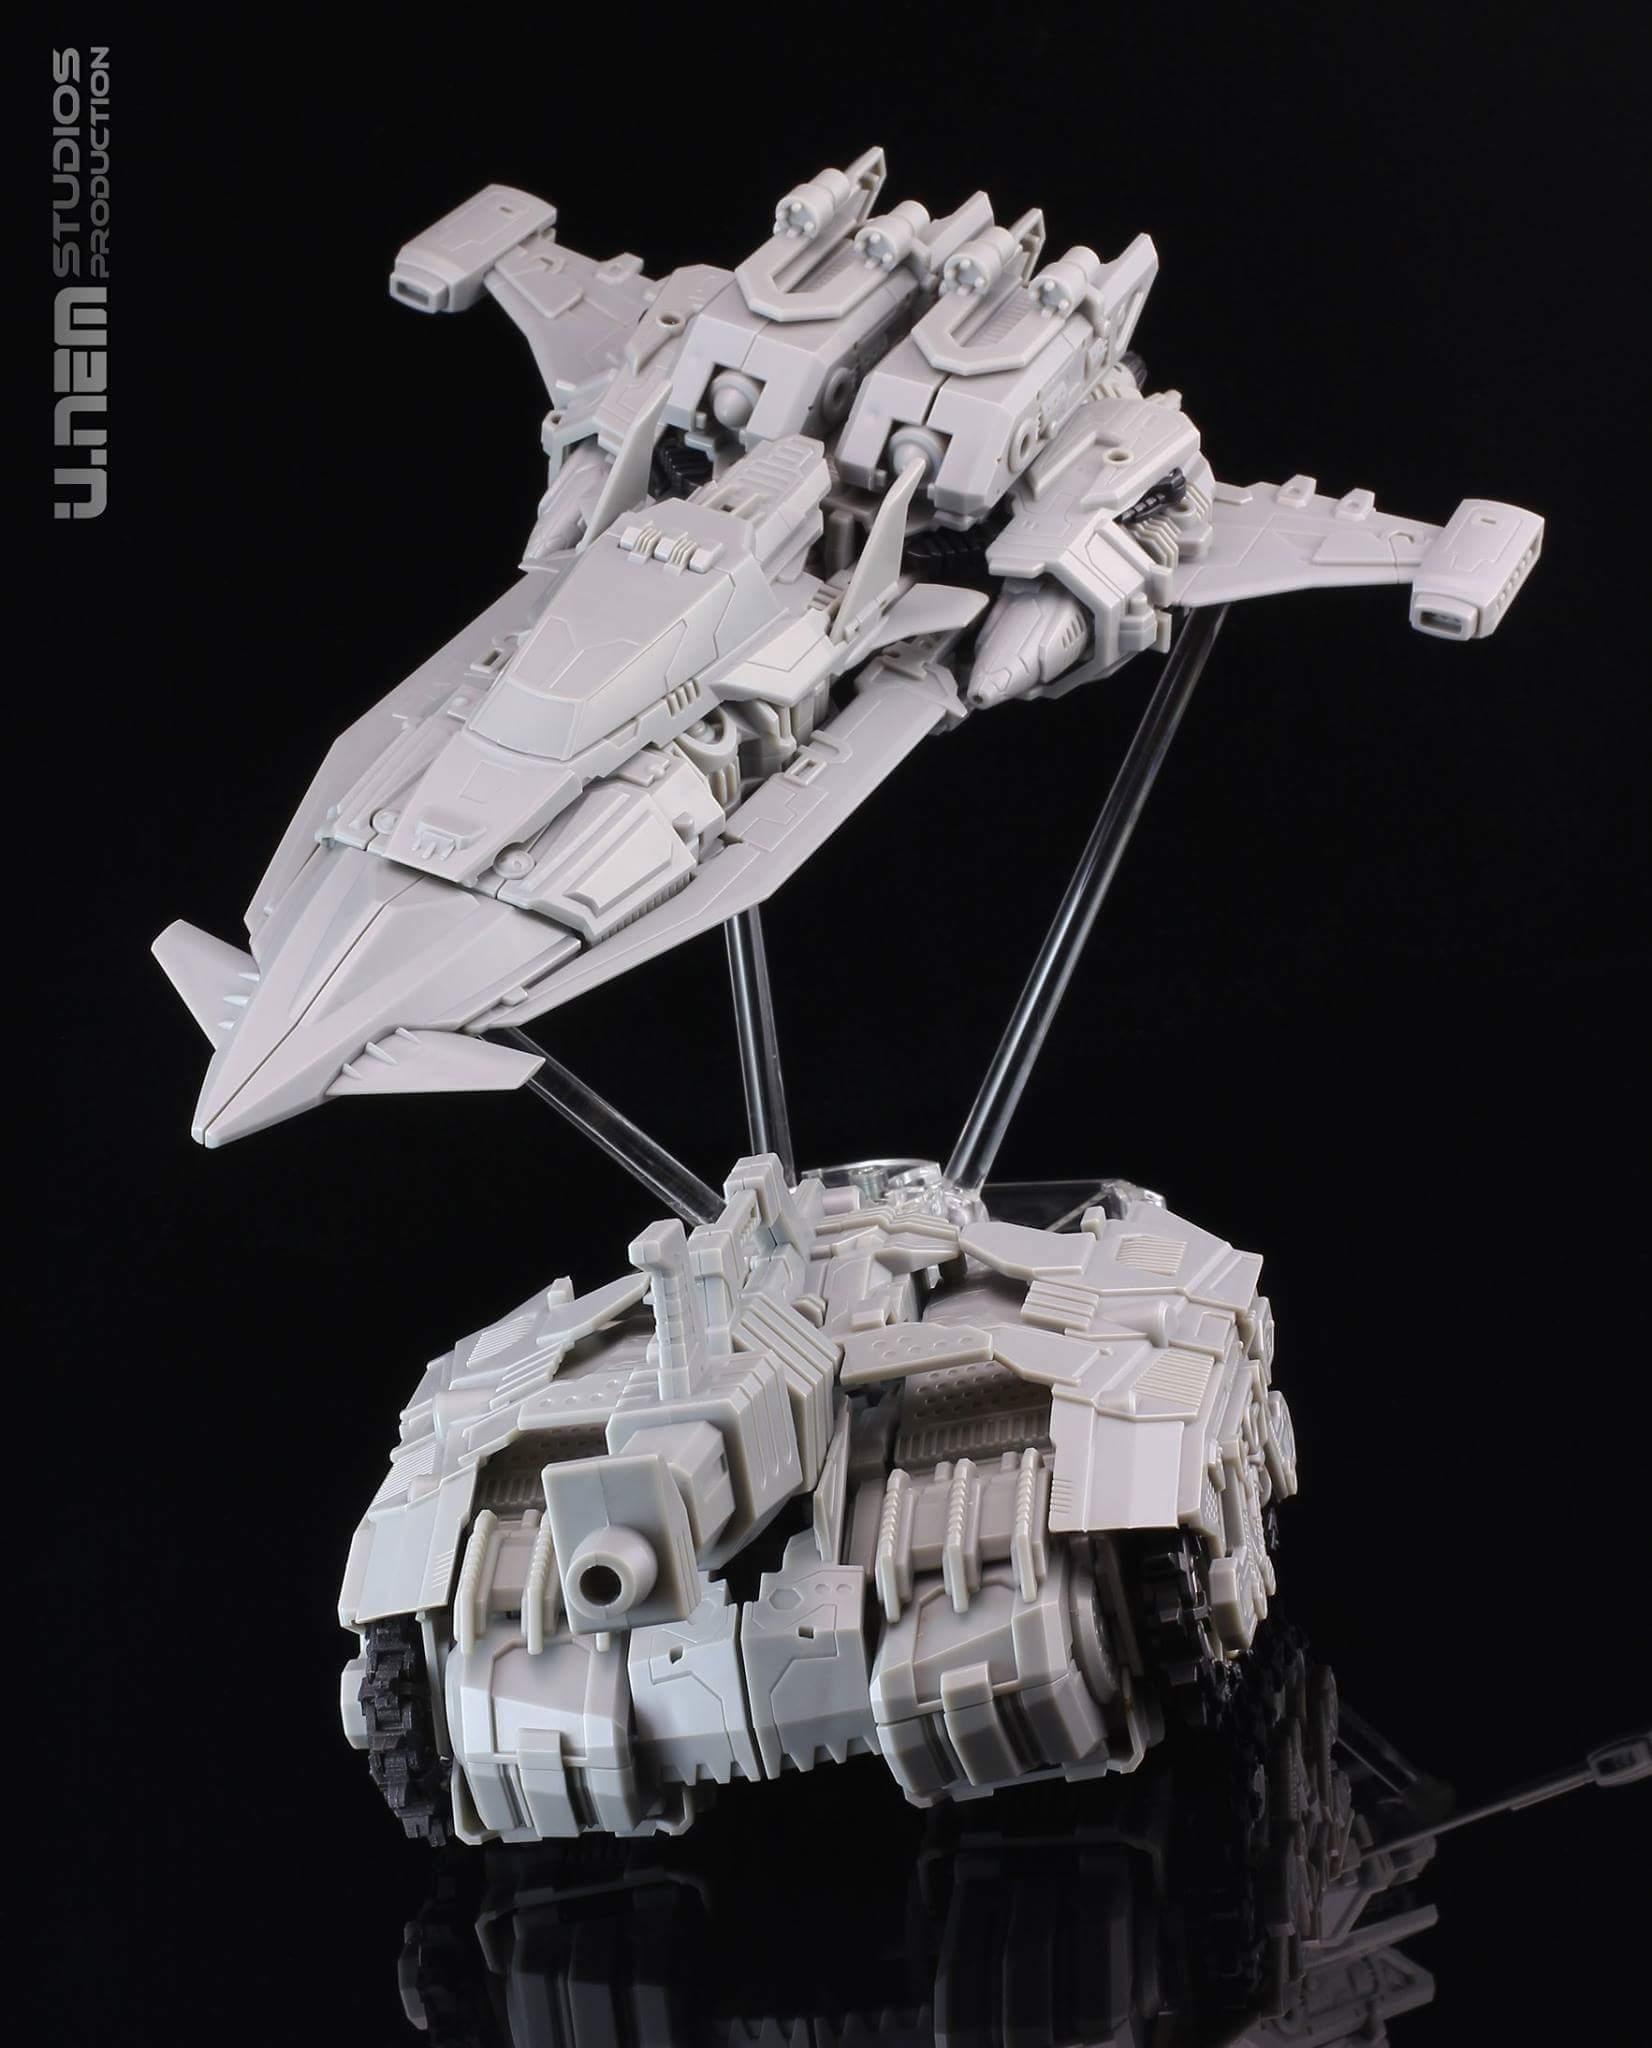 [Mastermind Creations] Produit Tiers - R-17 Carnifex - aka Overlord (TF Masterforce) X83zi2F0